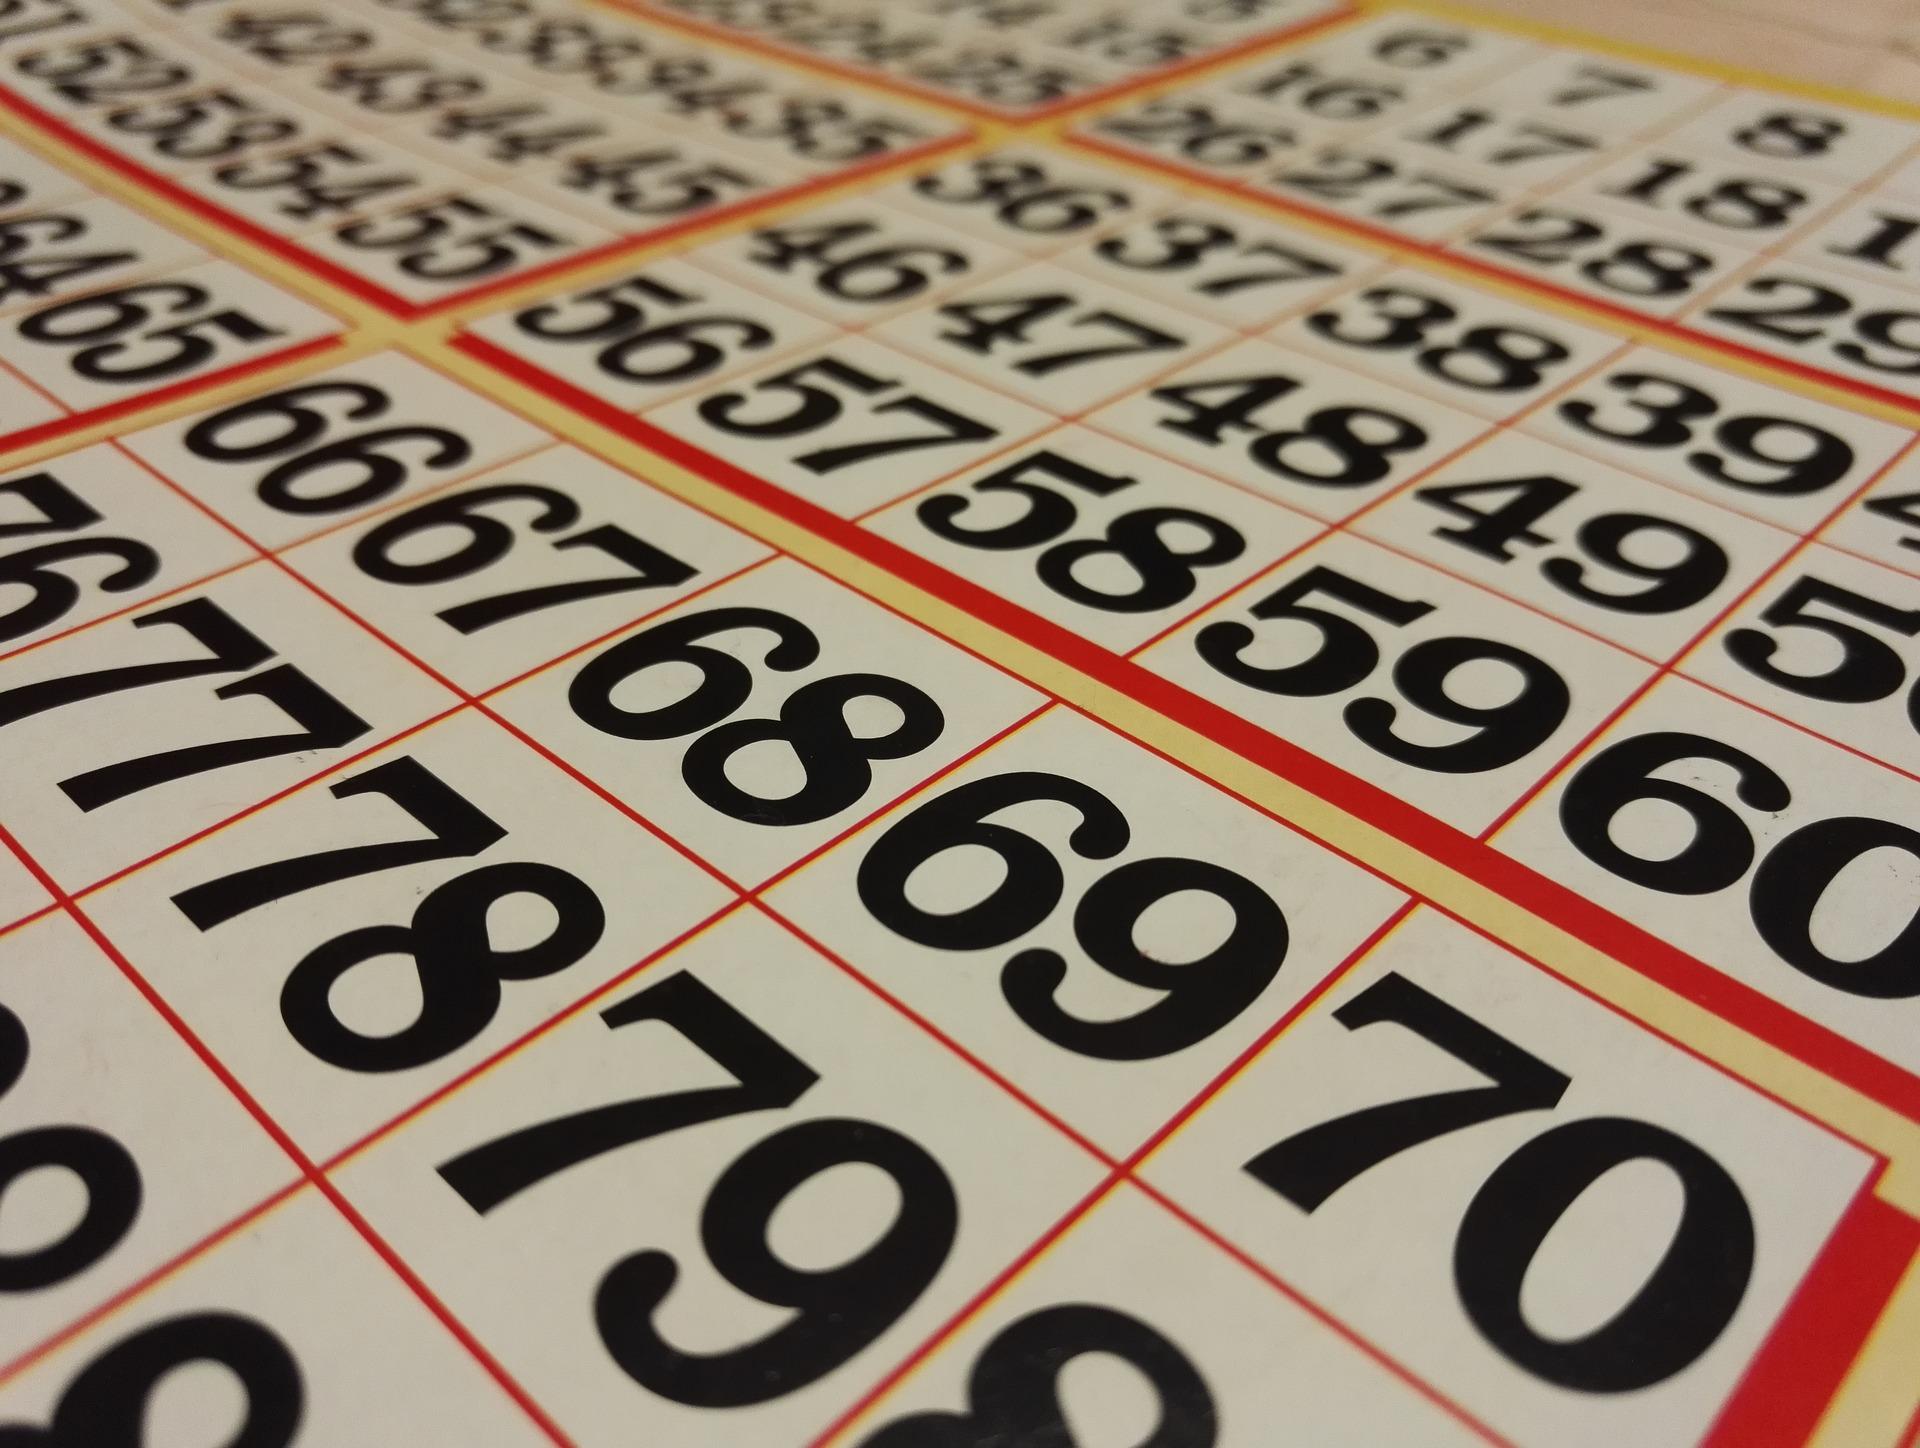 Bingo-Nachmittag